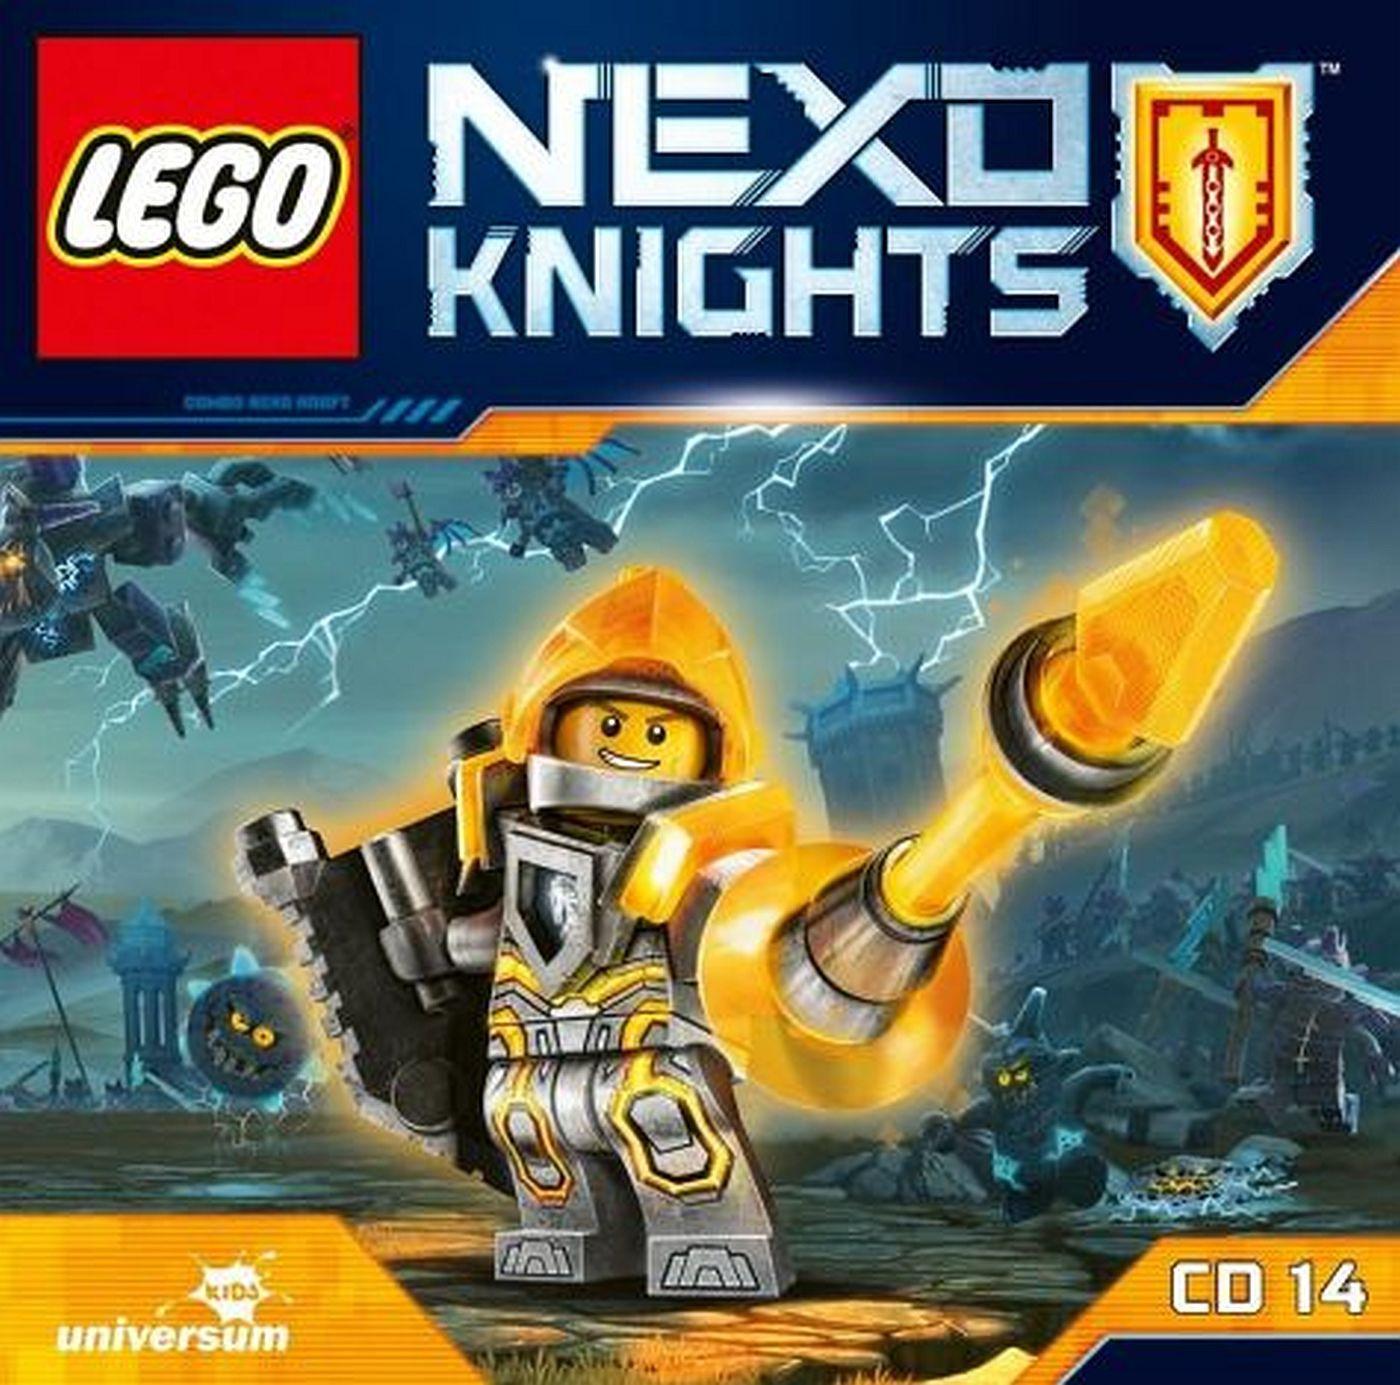 LEGO Nexo Knights (CD 14)